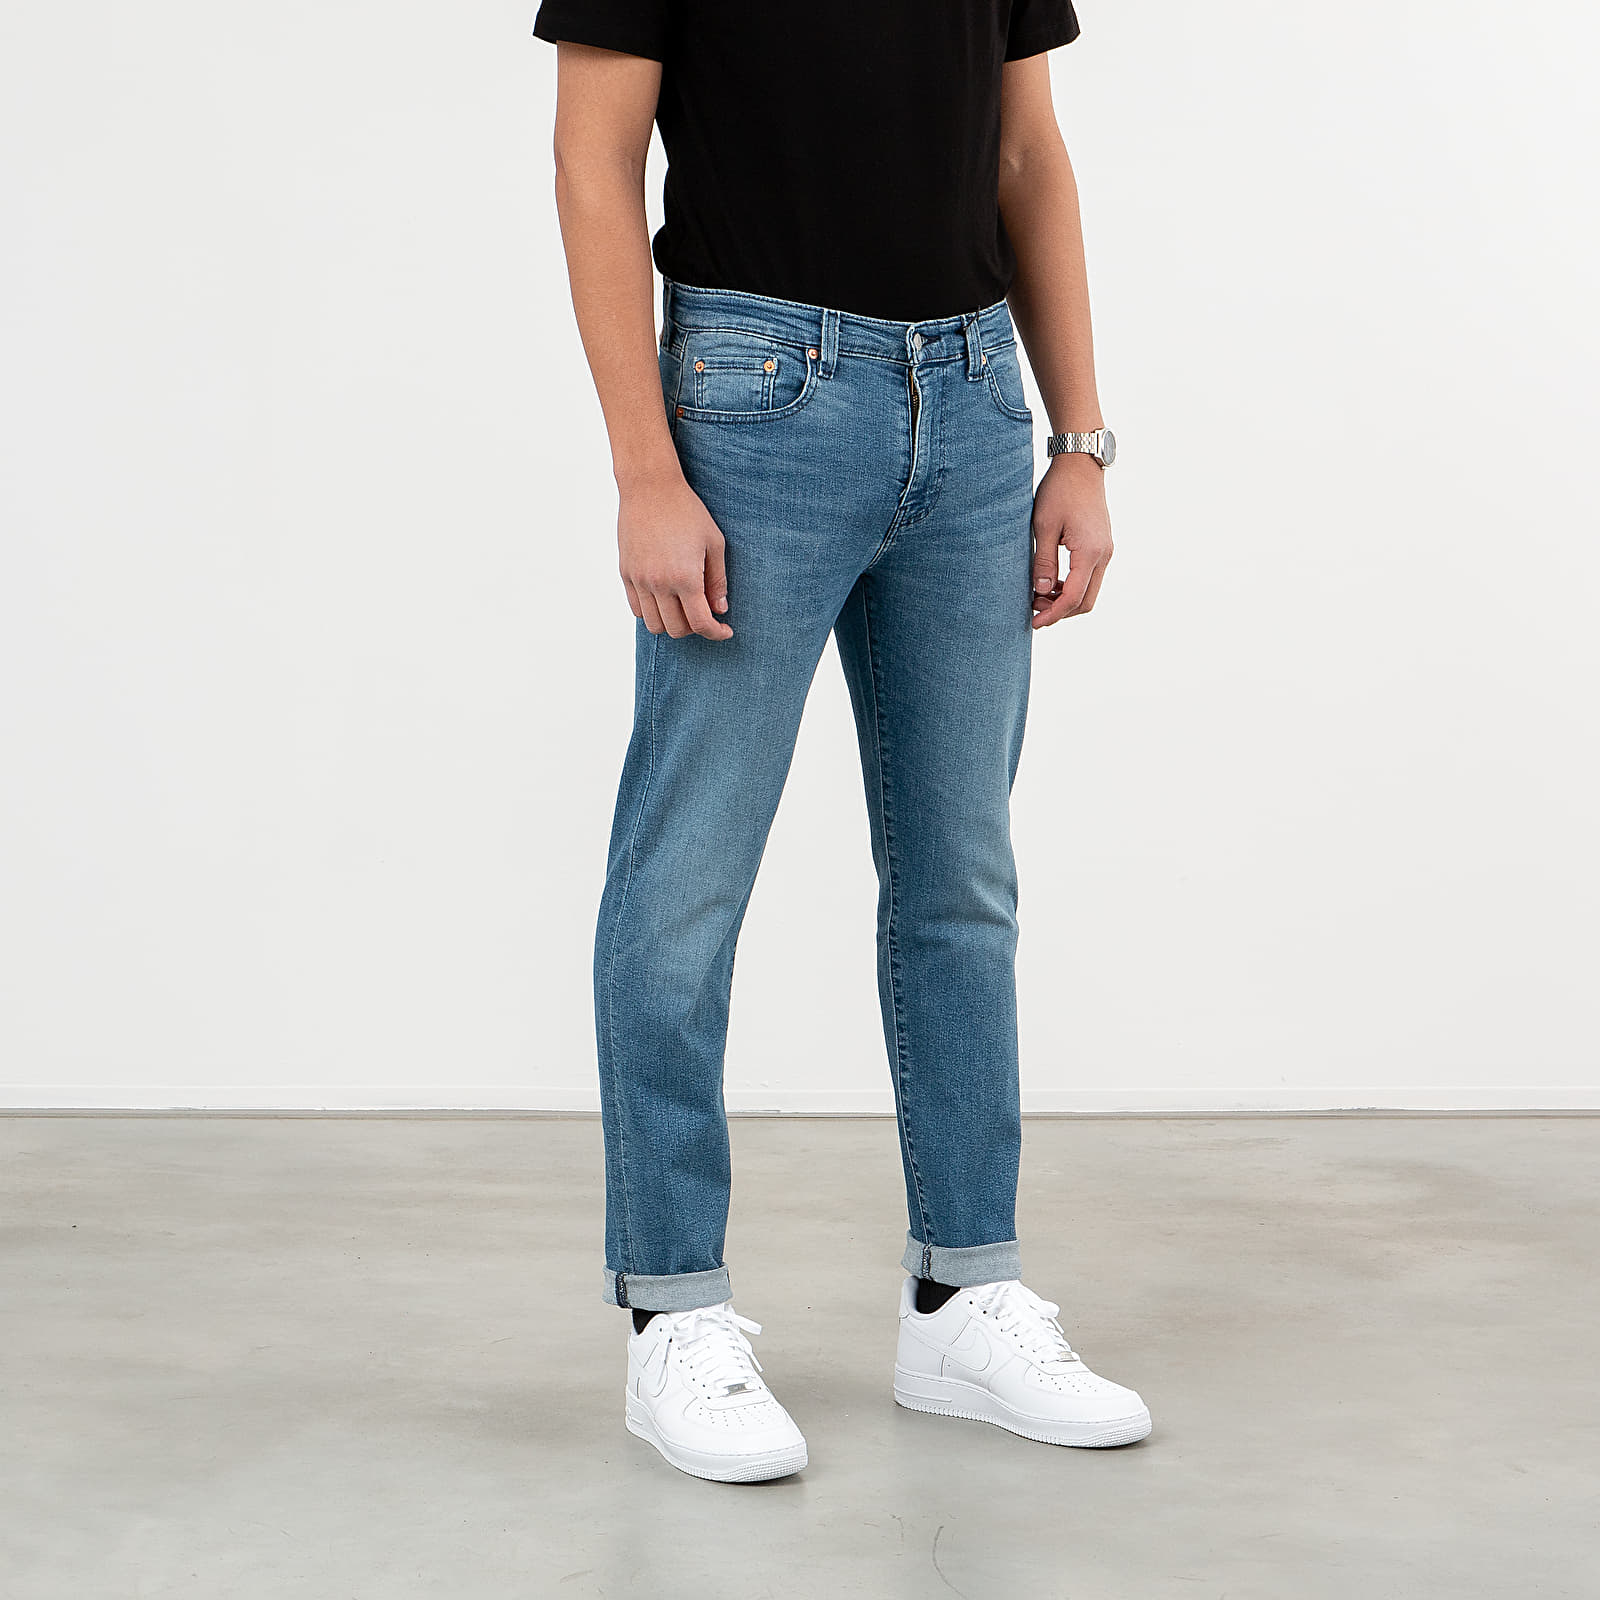 Pants and jeans Levi's® 502™ Regular Taper Jeans Cedar Light